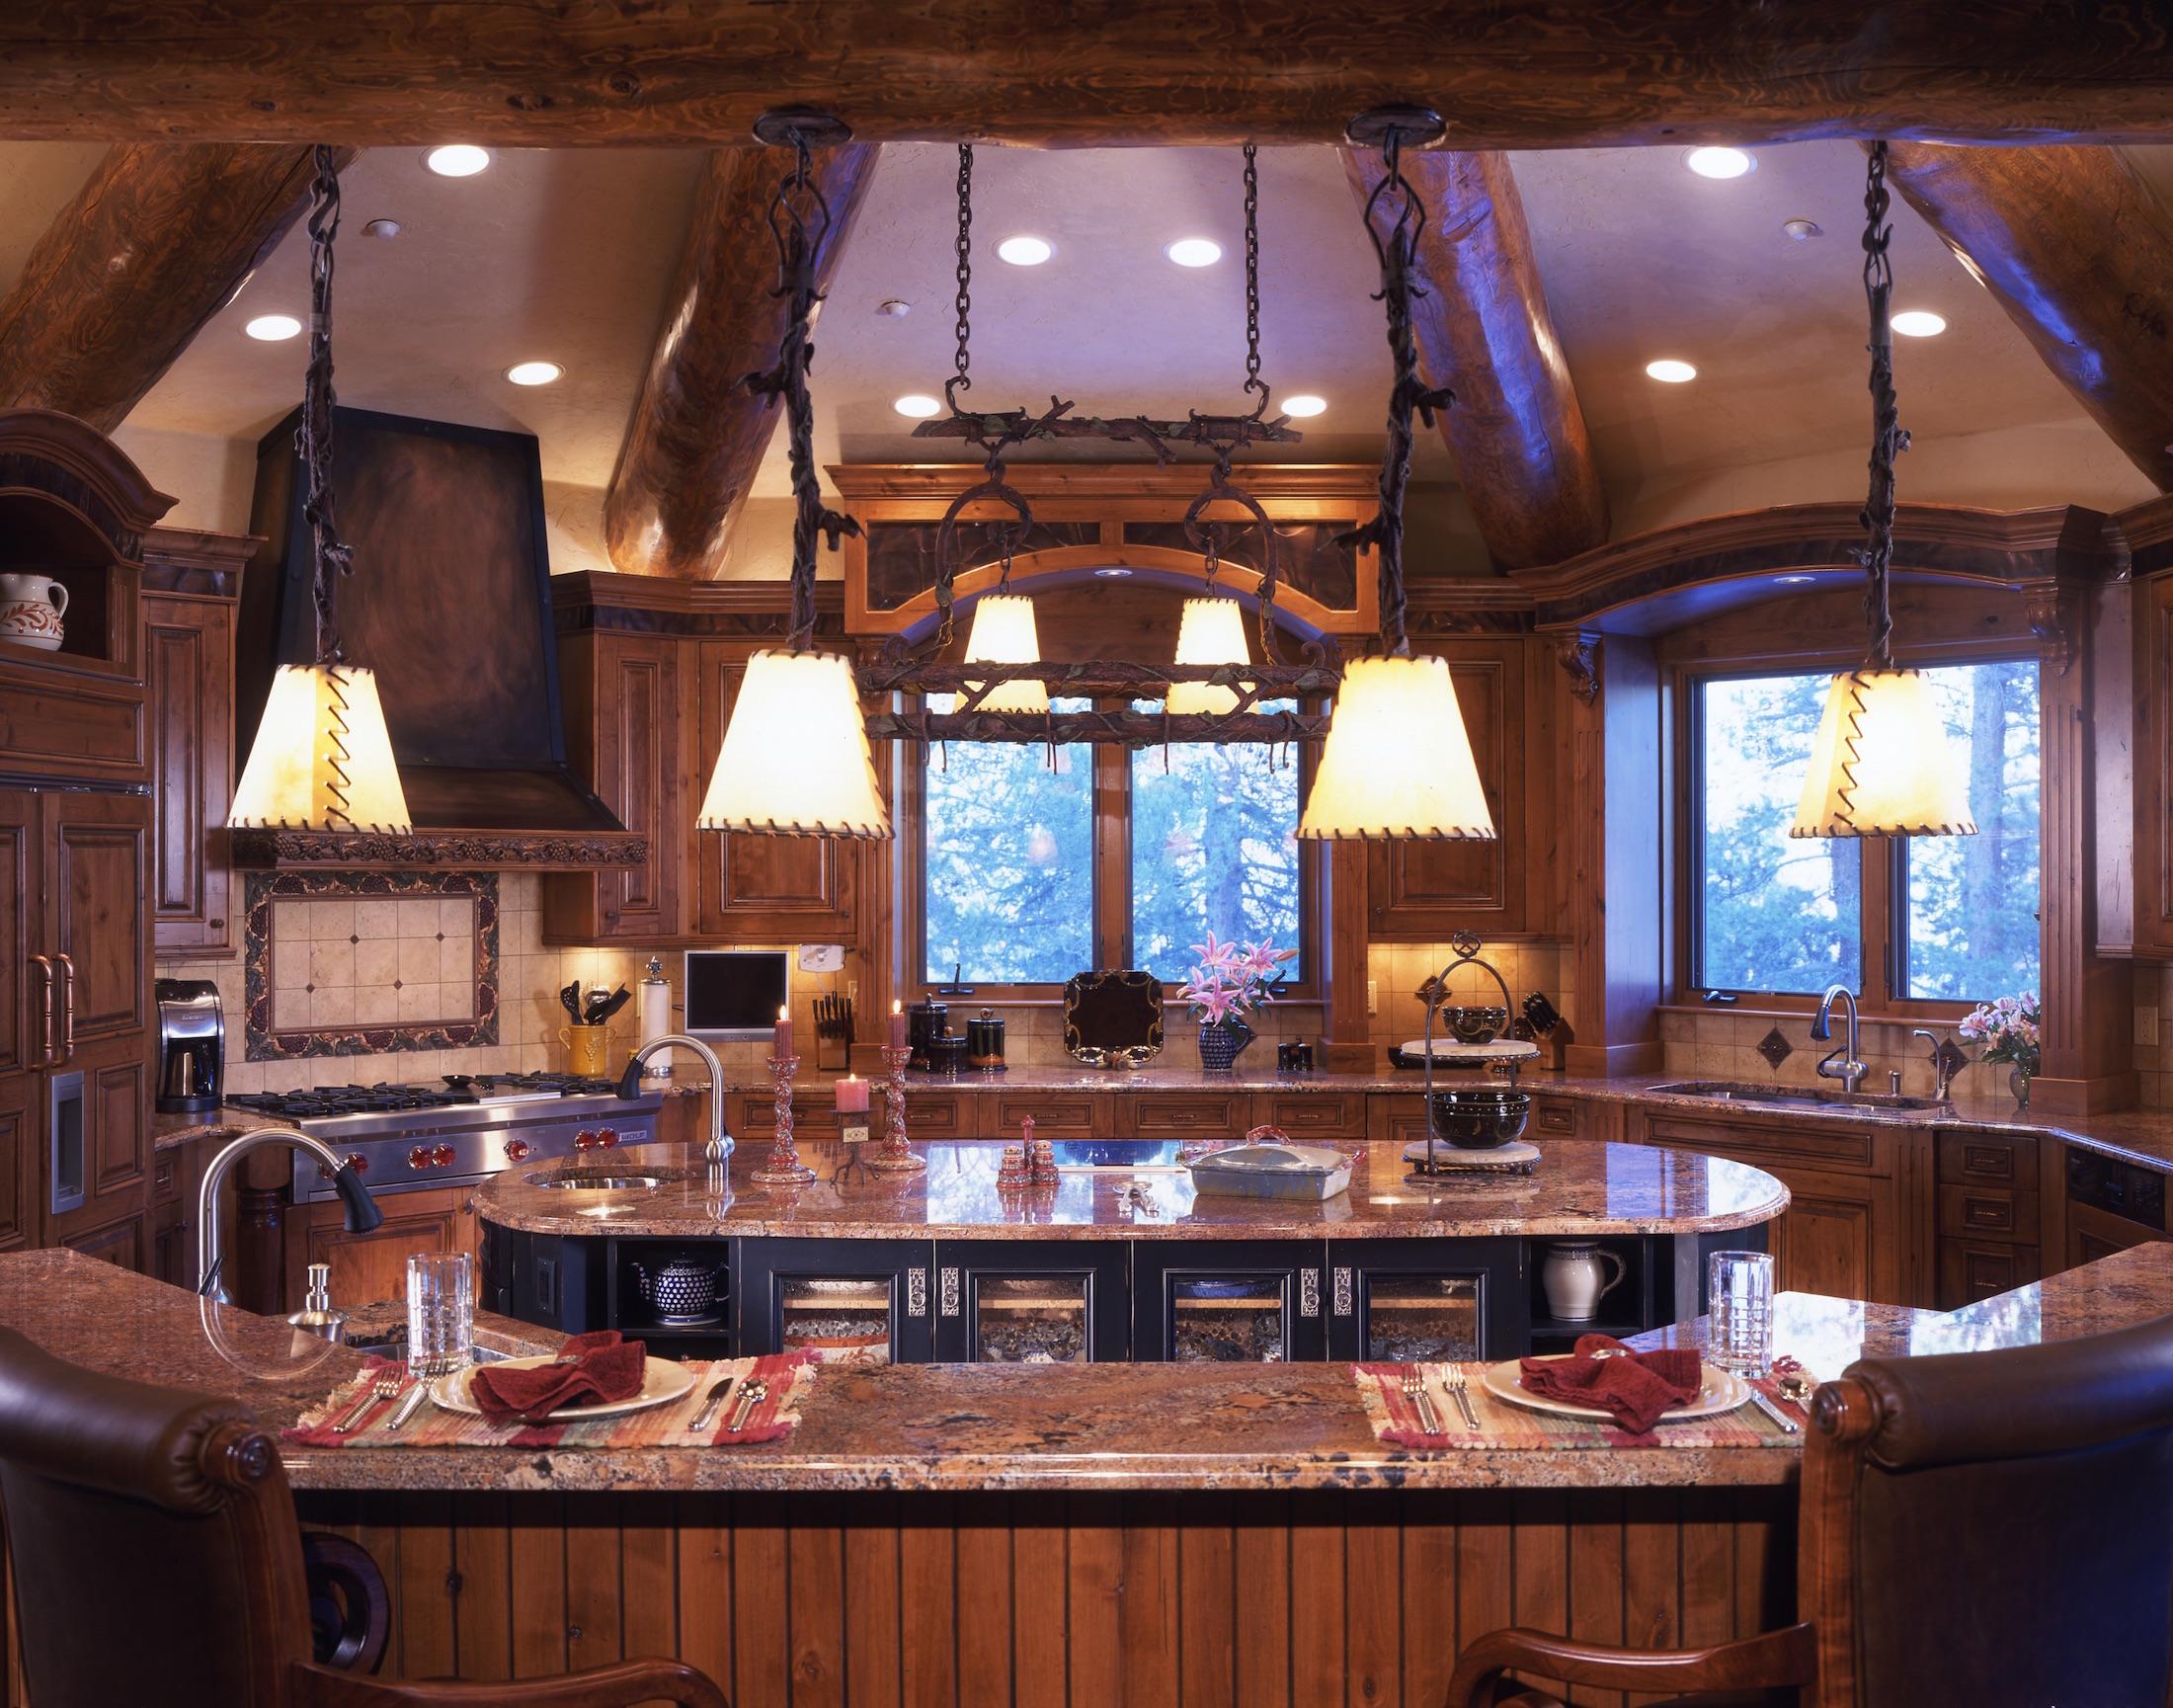 Blue River Home Kitchen